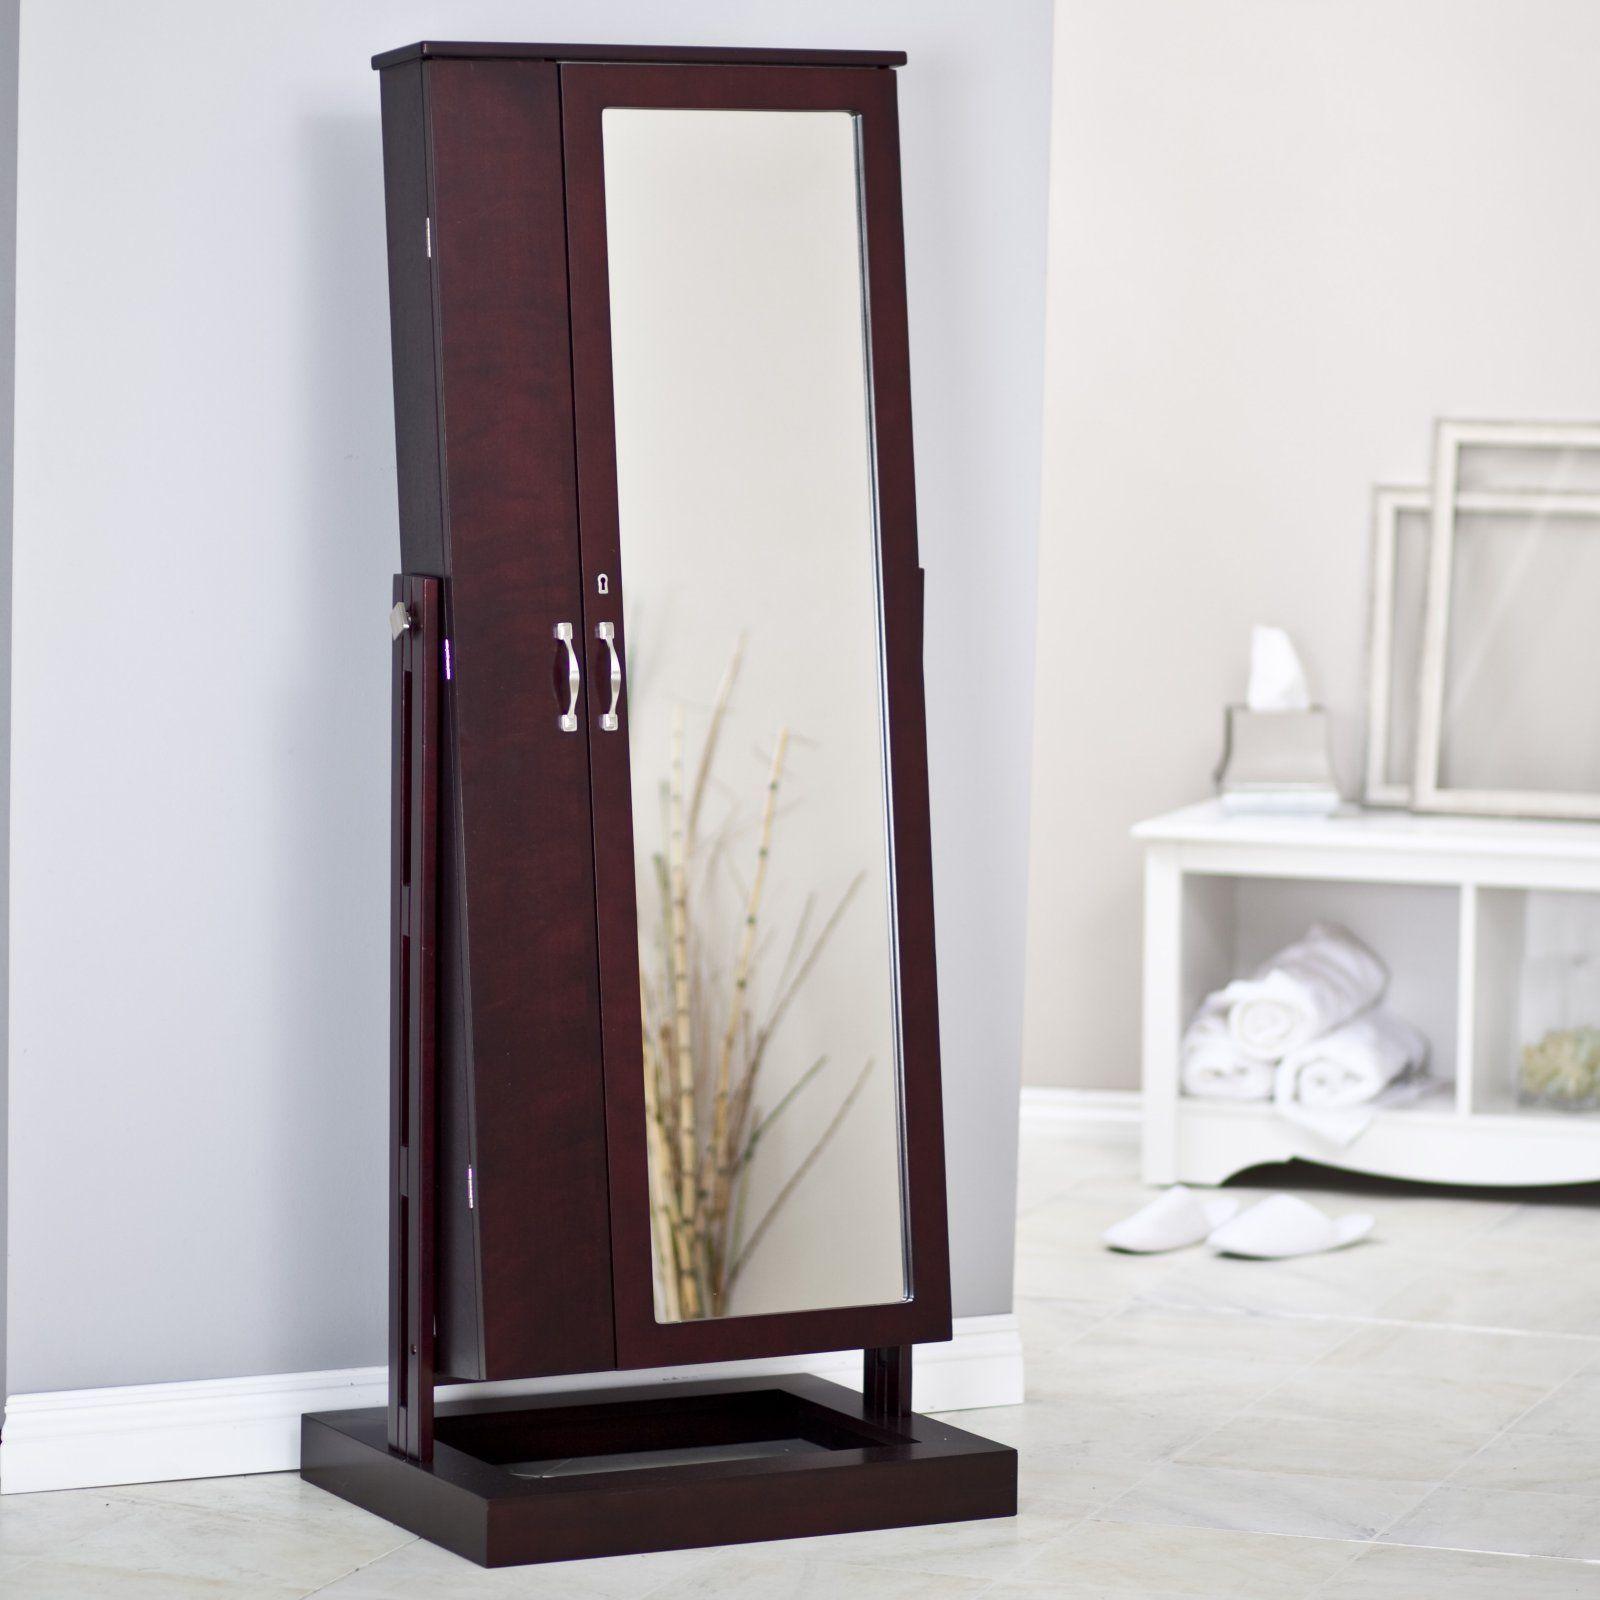 Mirror jewelry armoire good idea decoracion para mi for Espejo joyero casa